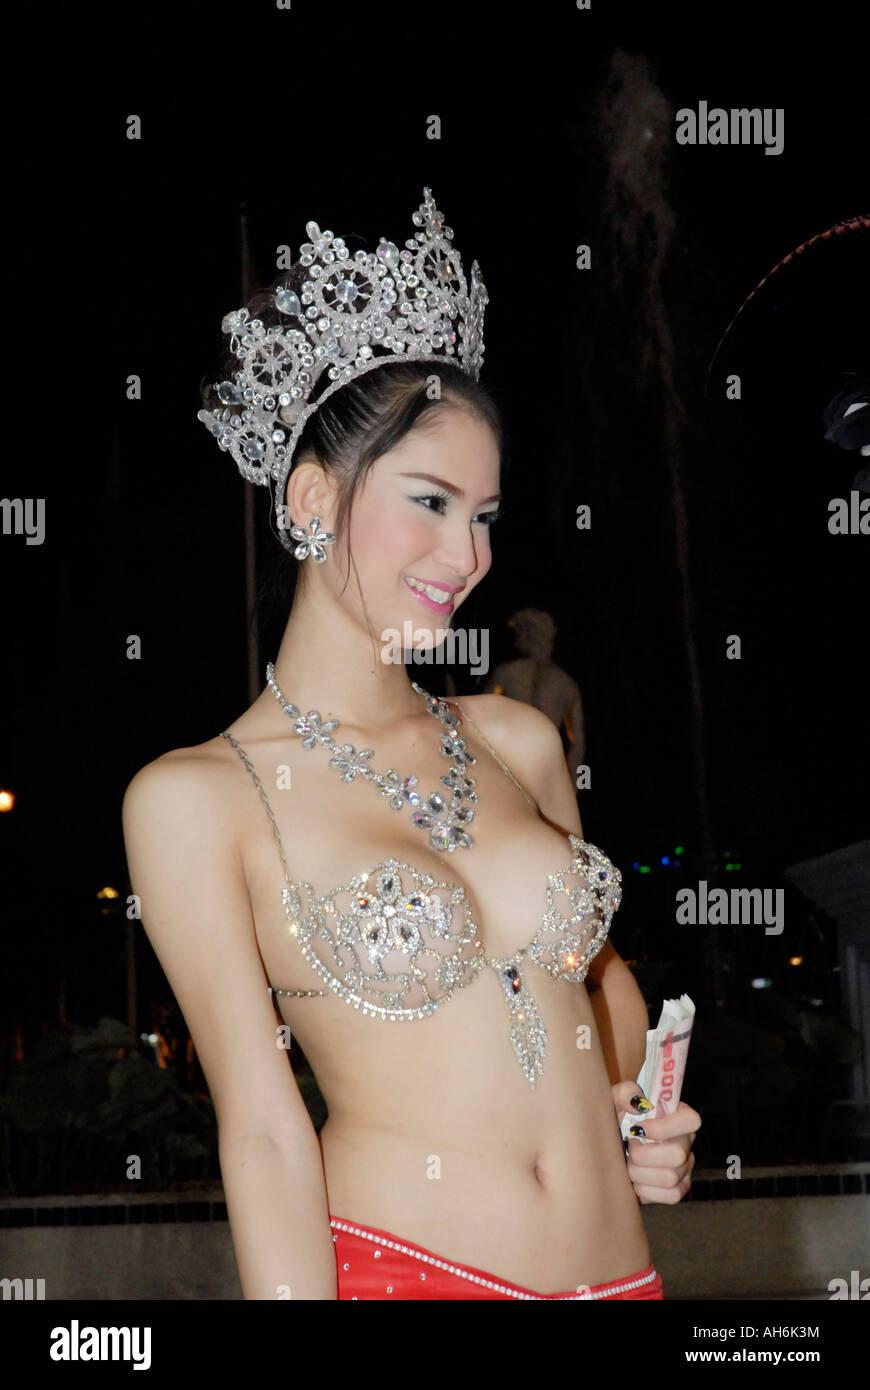 Thailand girl show